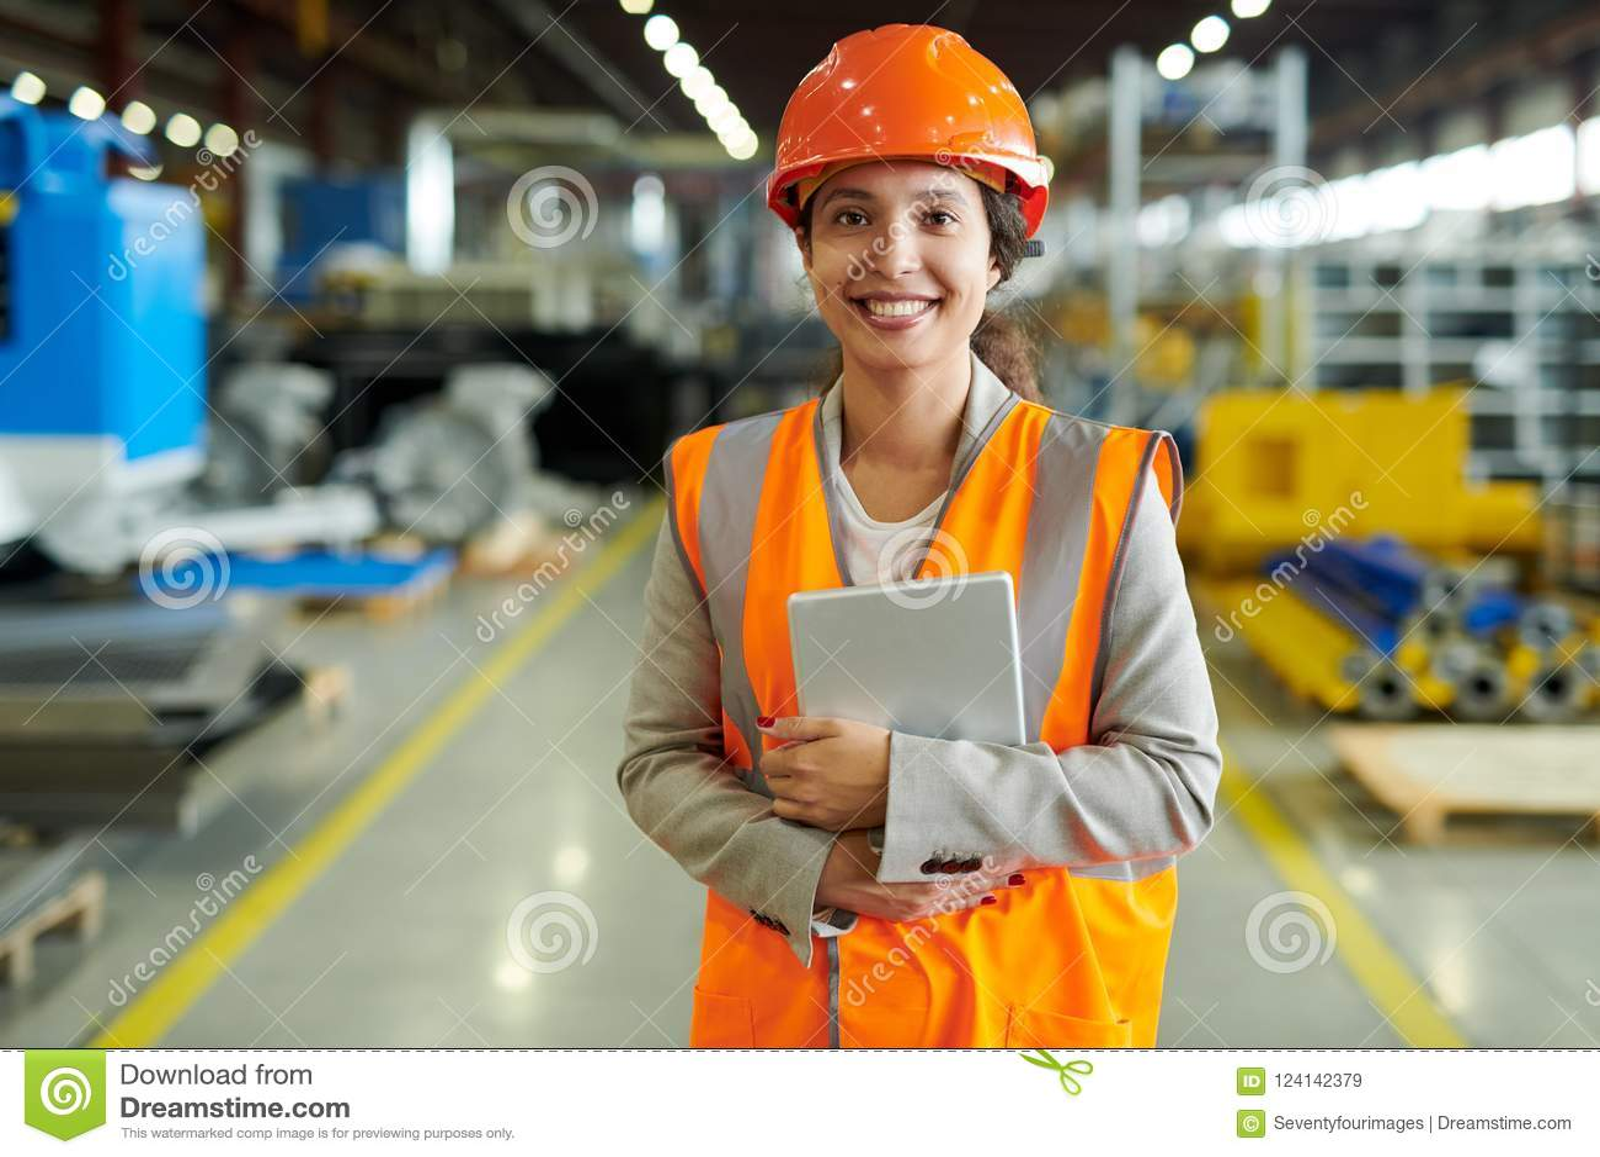 Cheerful Factory Worker Posing